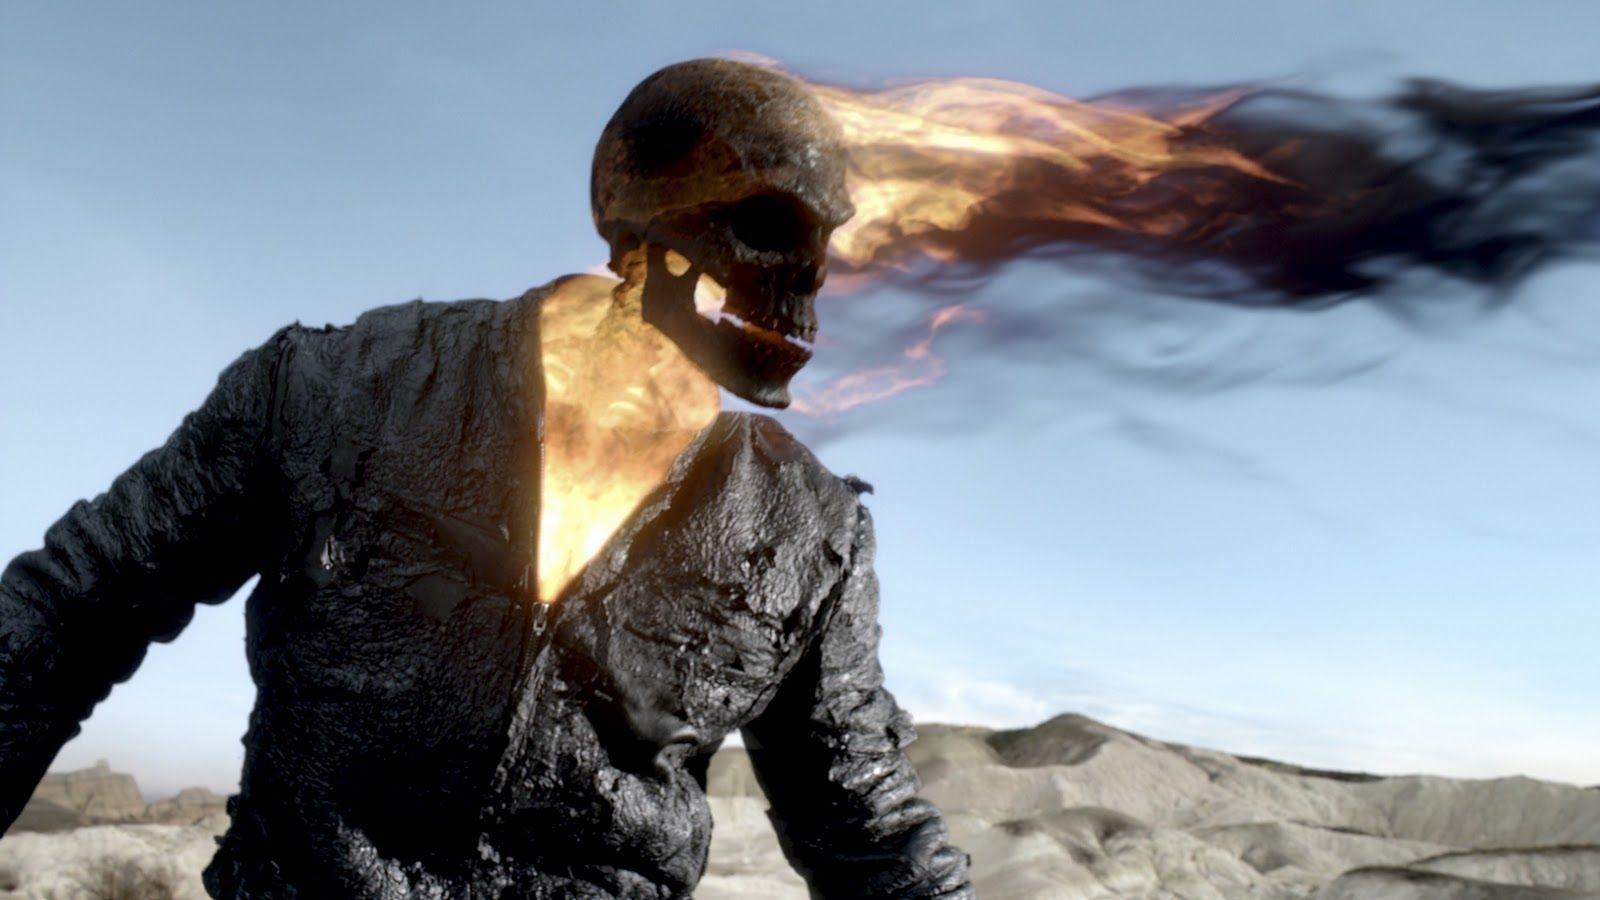 Ghost Rider: Spirit of Vengeance' Image Gallery | ScreenRant